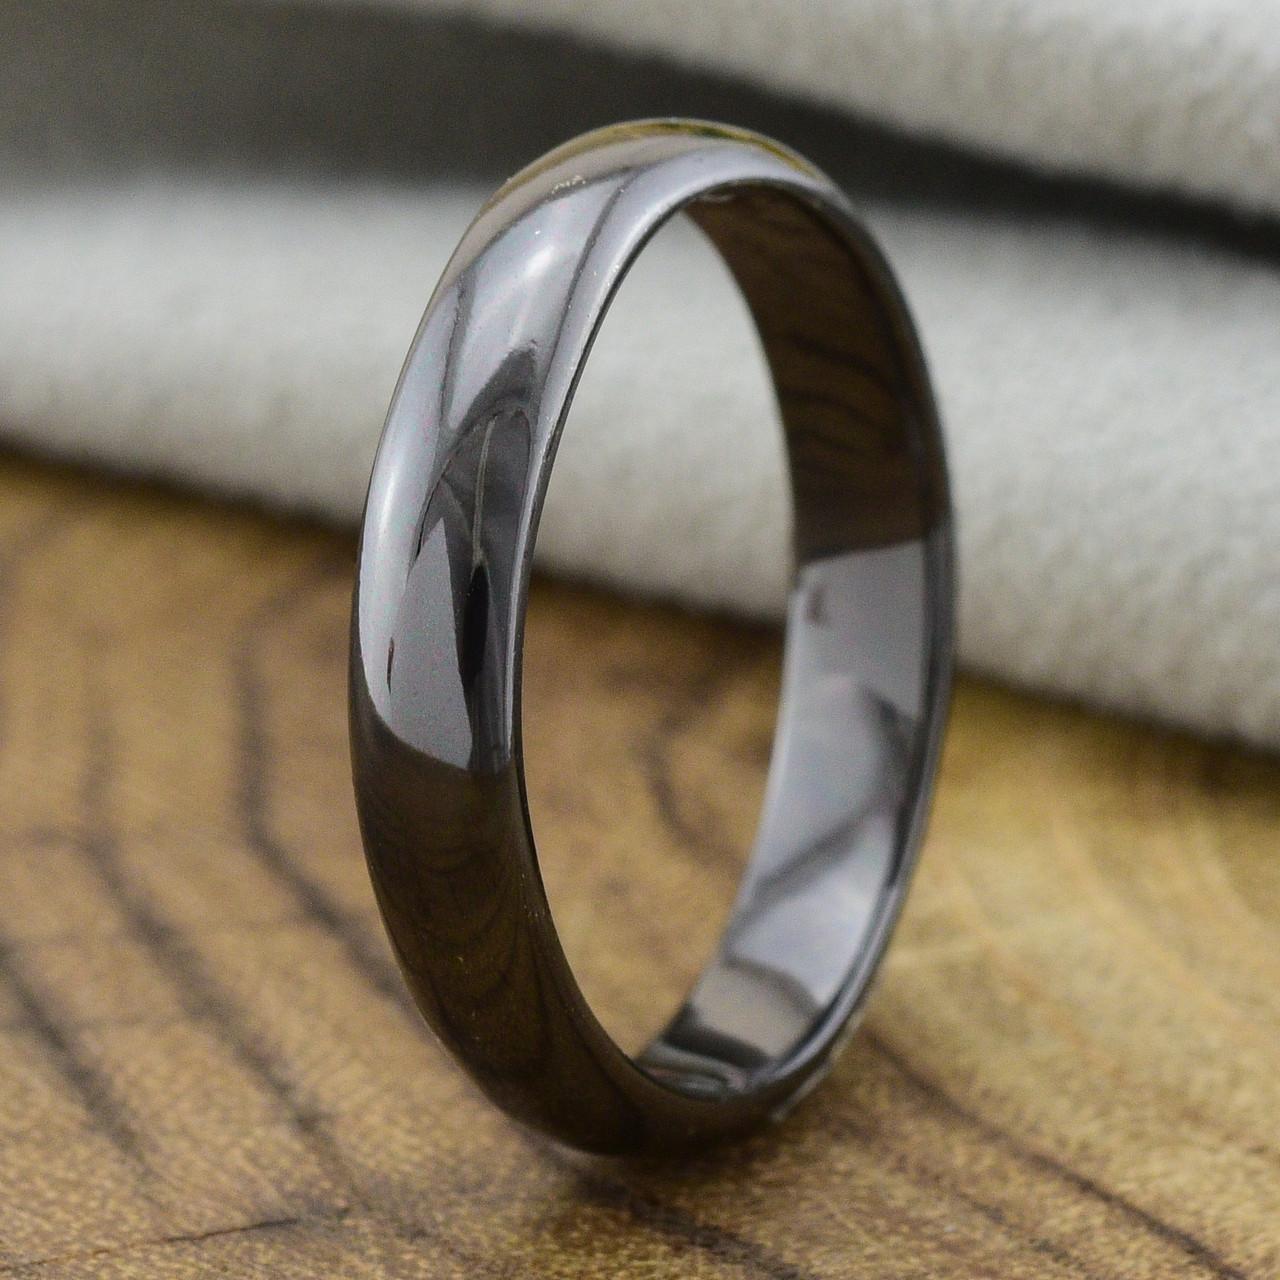 Кольцо Xuping  29141 размер 23 ширина 4 мм вес 3.6 г черная керамика